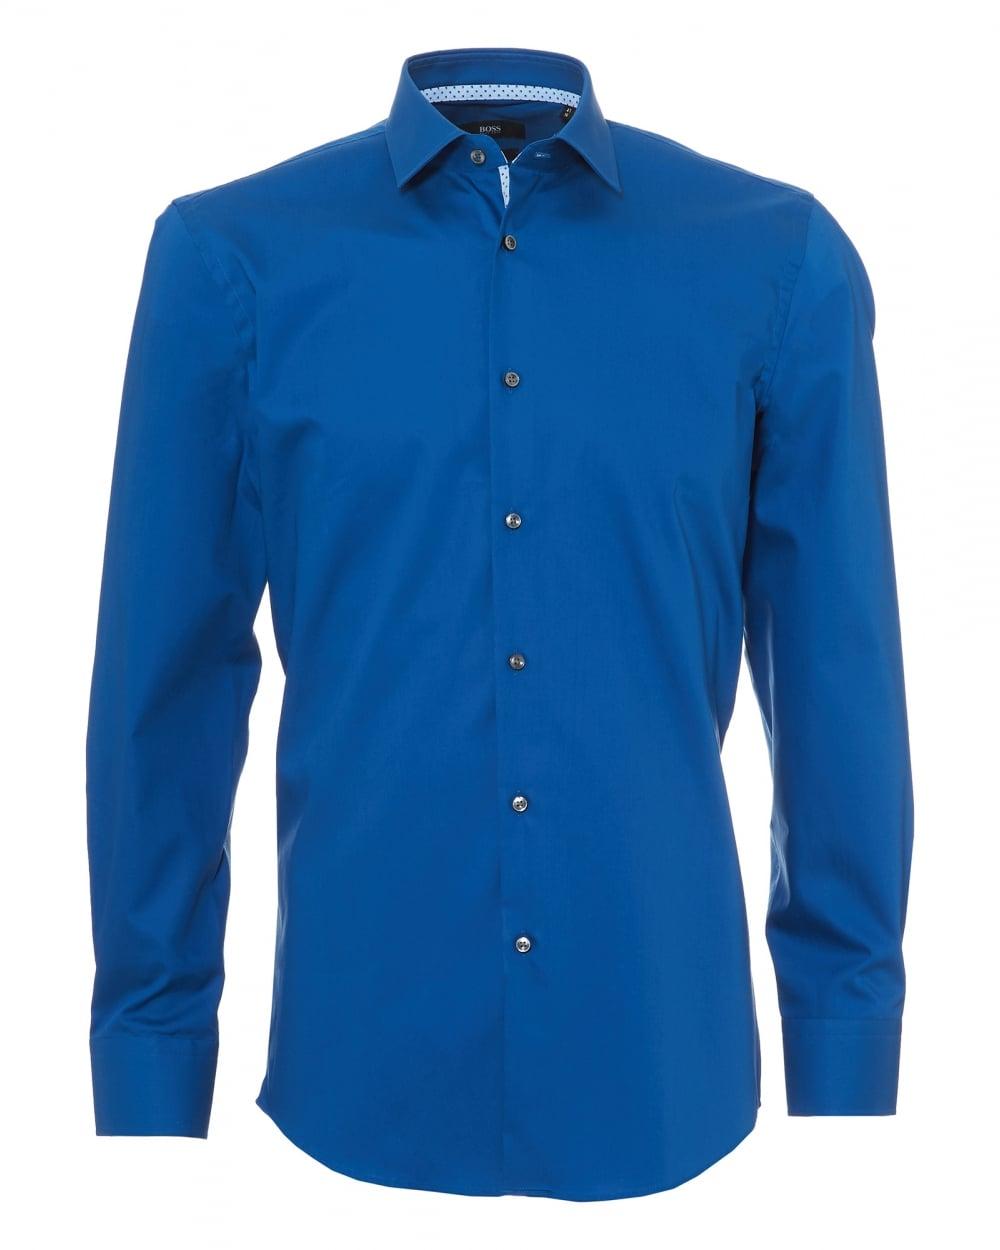 04a9673eb Hugo Boss Mens Jesse Shirt, Geo Print Trim Slim Fit Royal Blue Shirt